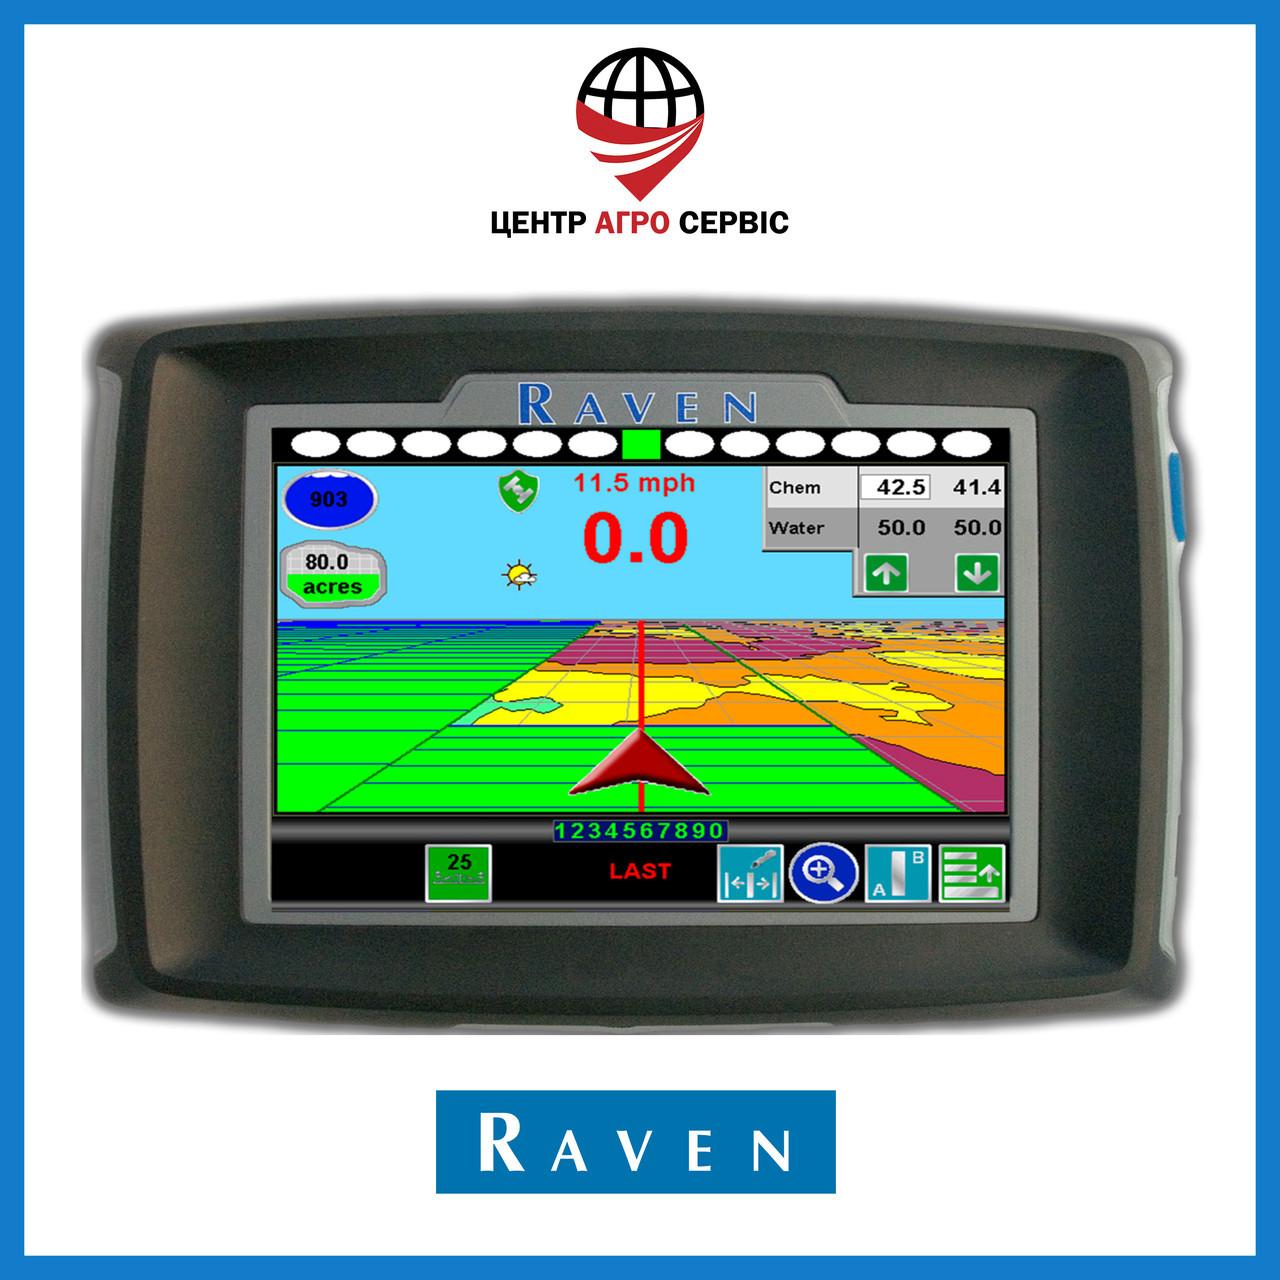 Gps навигатор для трактора (навигатор для поля, сельхоз навигатор)  RAVEN envizio pro